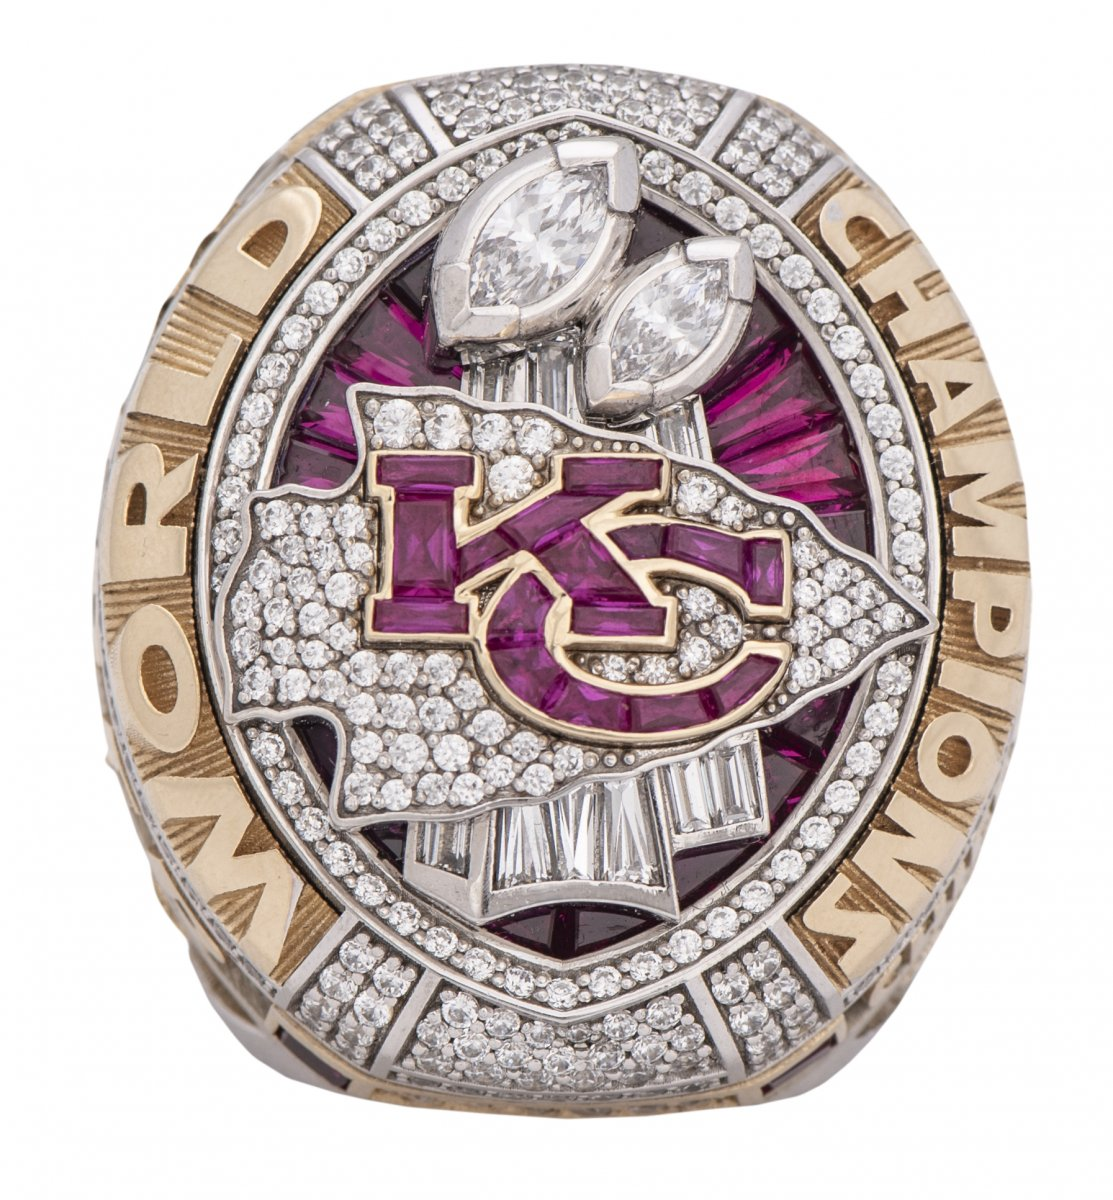 Mike Weber's ring